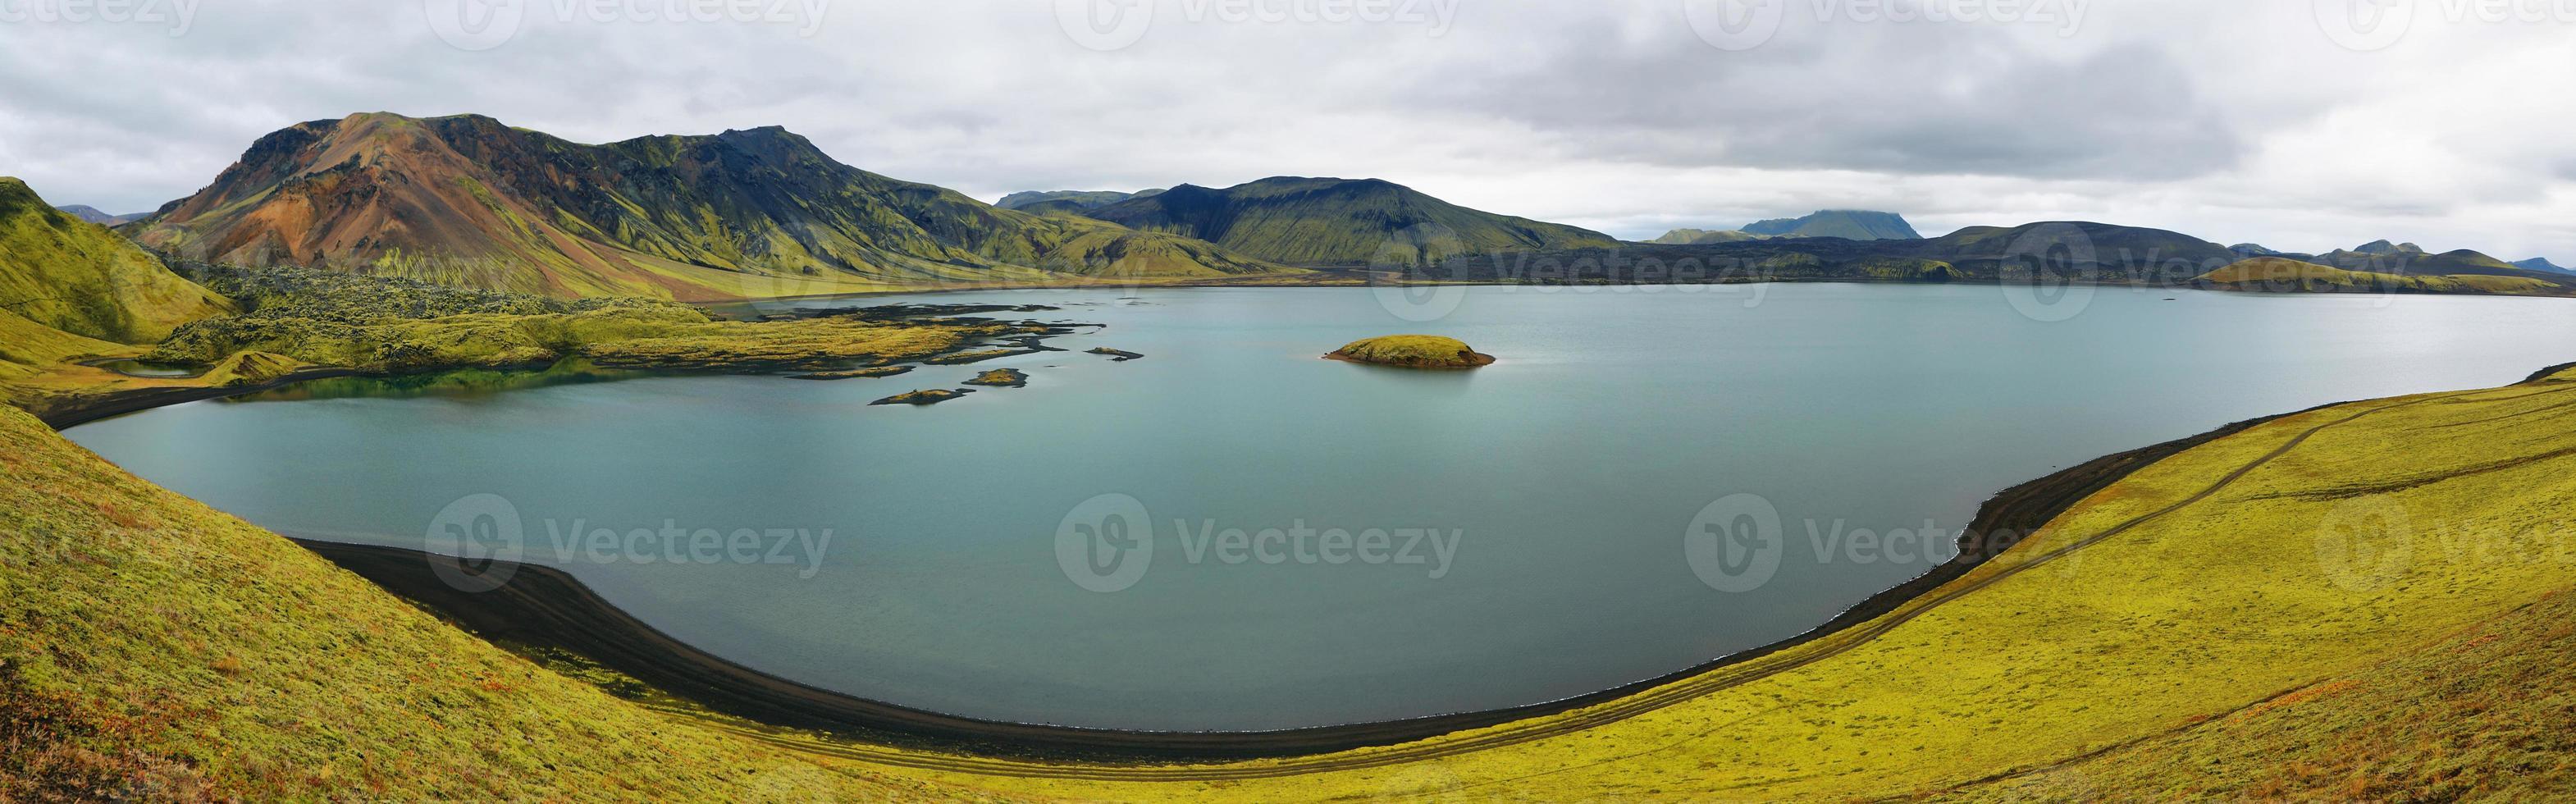 Frostastadavatn lake photo